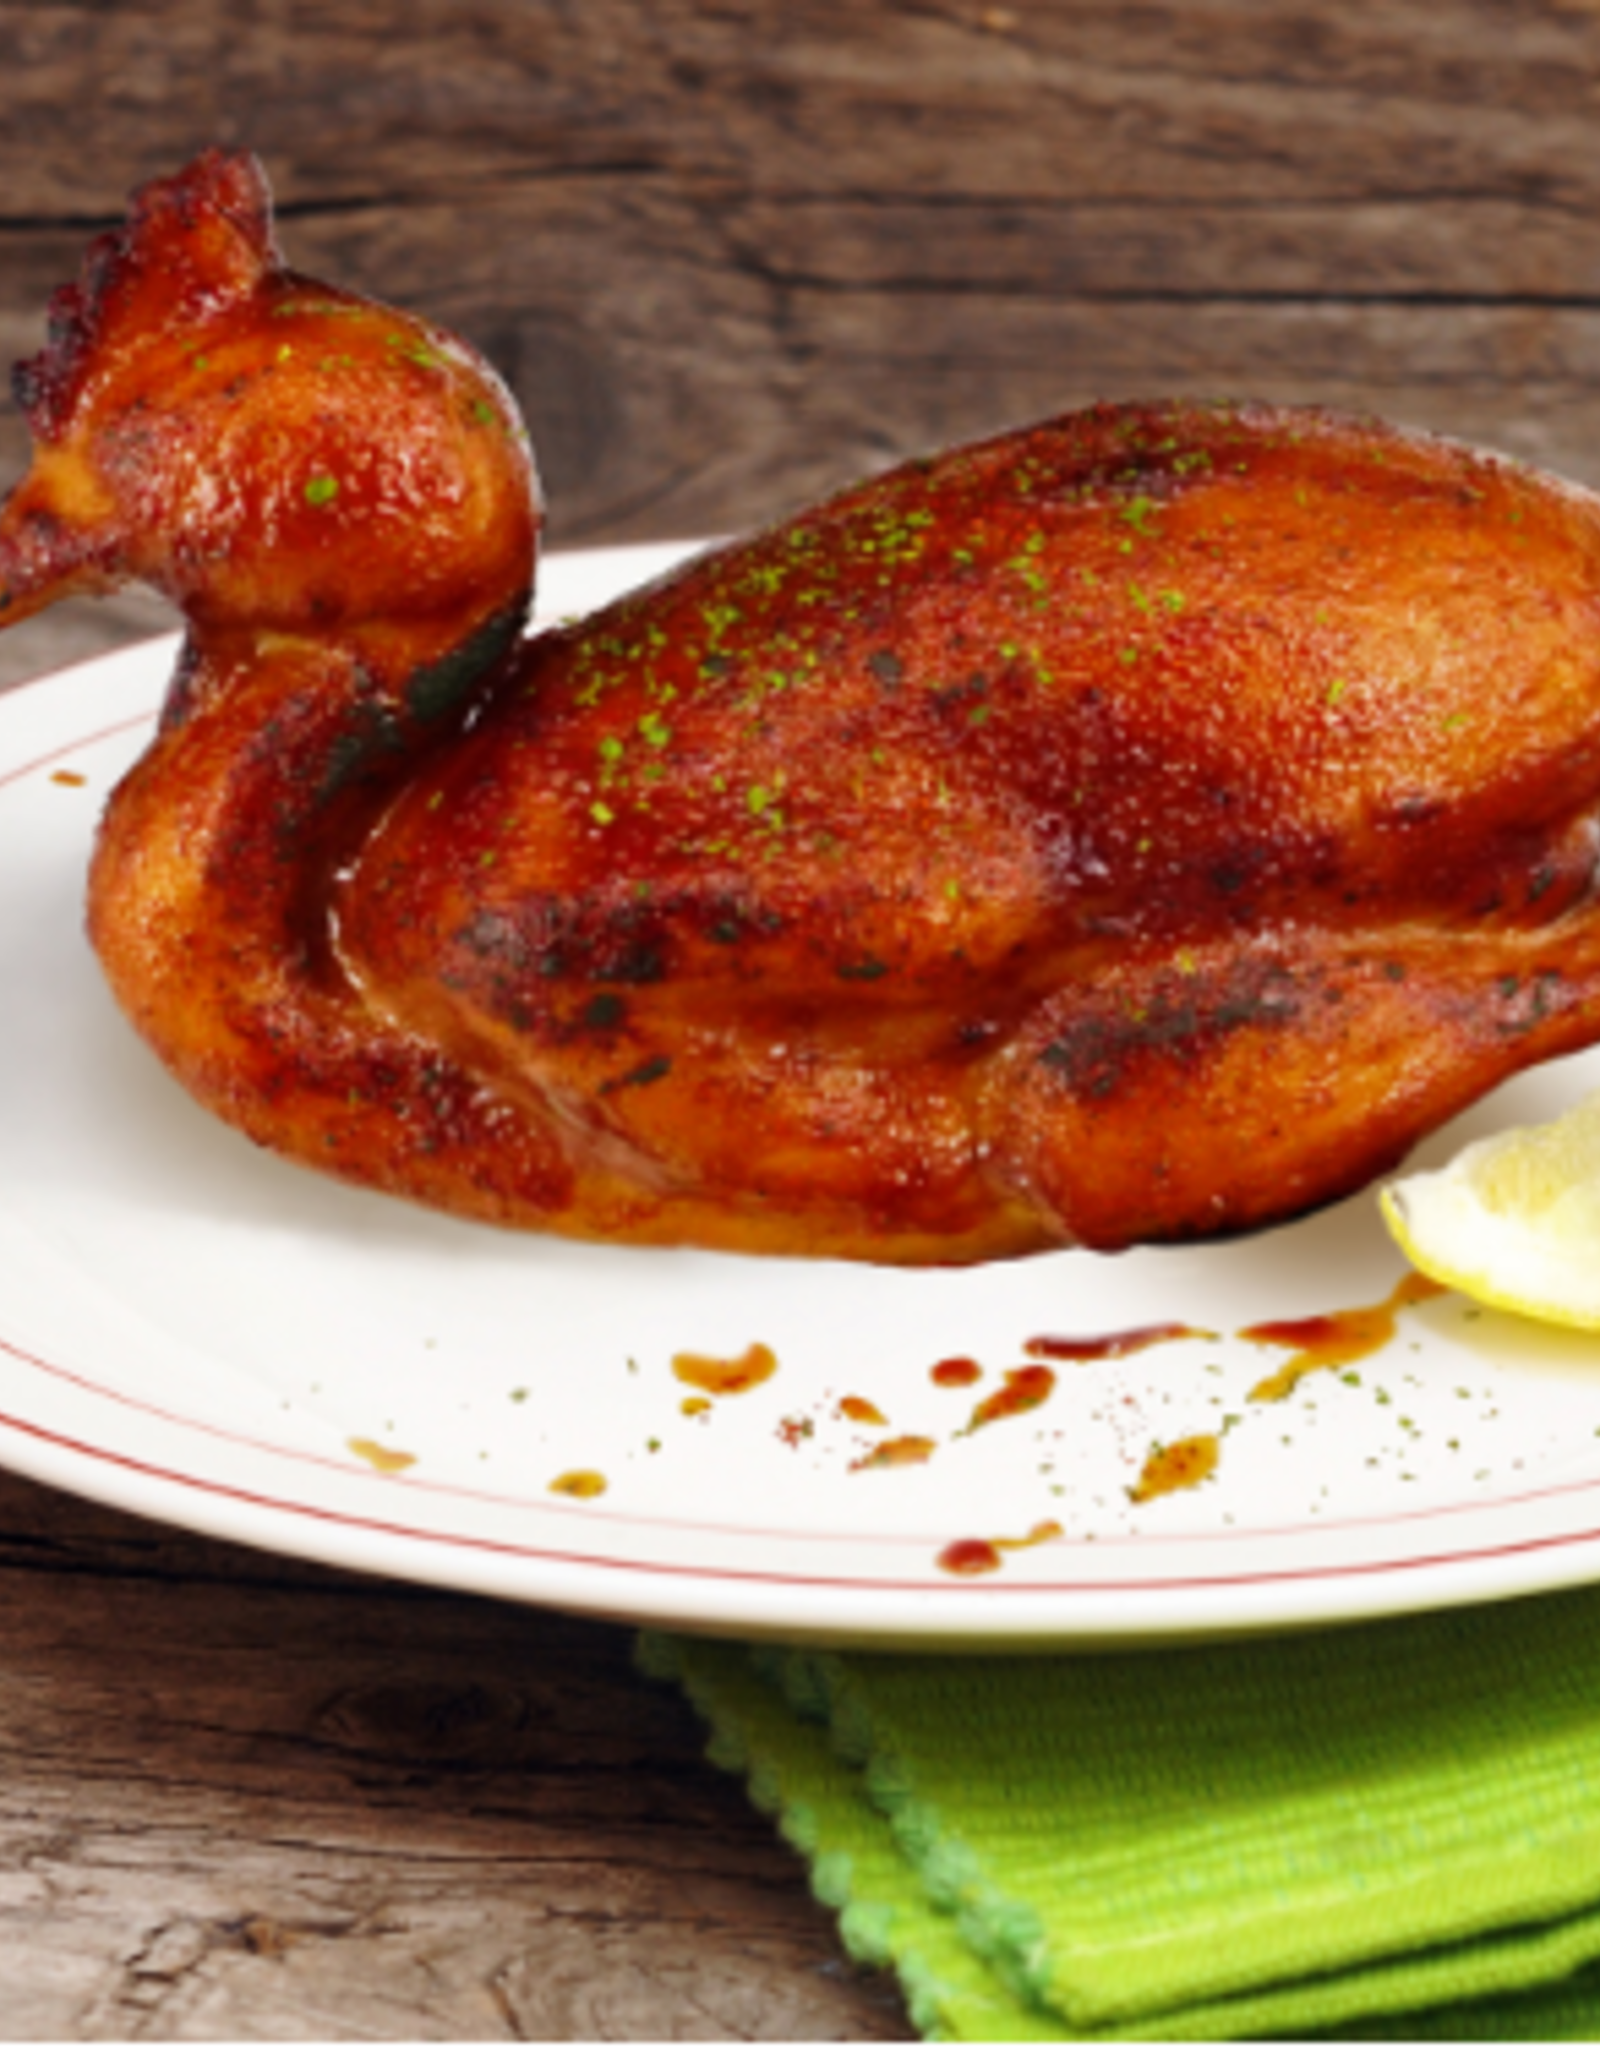 Vegefarm * 松珍 (VF) Vege Roasted Chicken*(松珍) 貴妃嫩雞